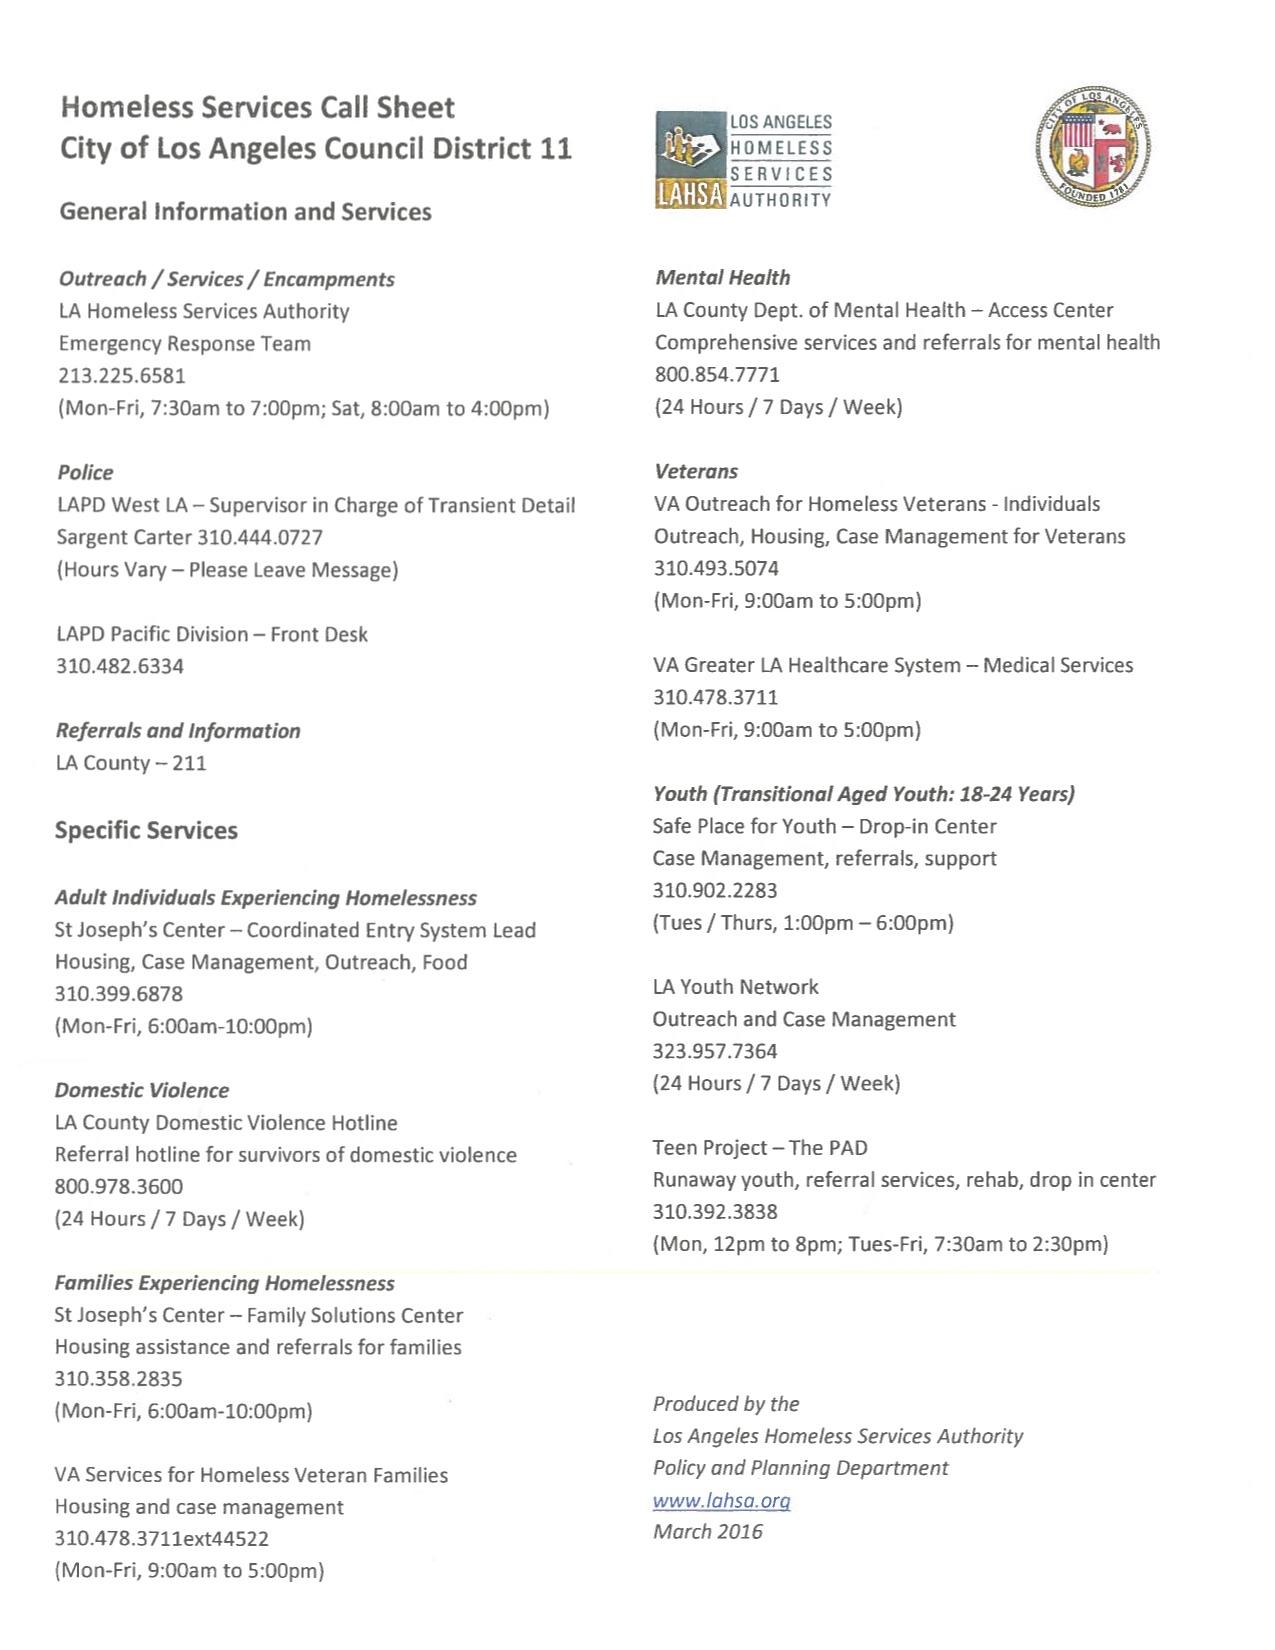 Homeless Services Call Sheet - CD 11 copy